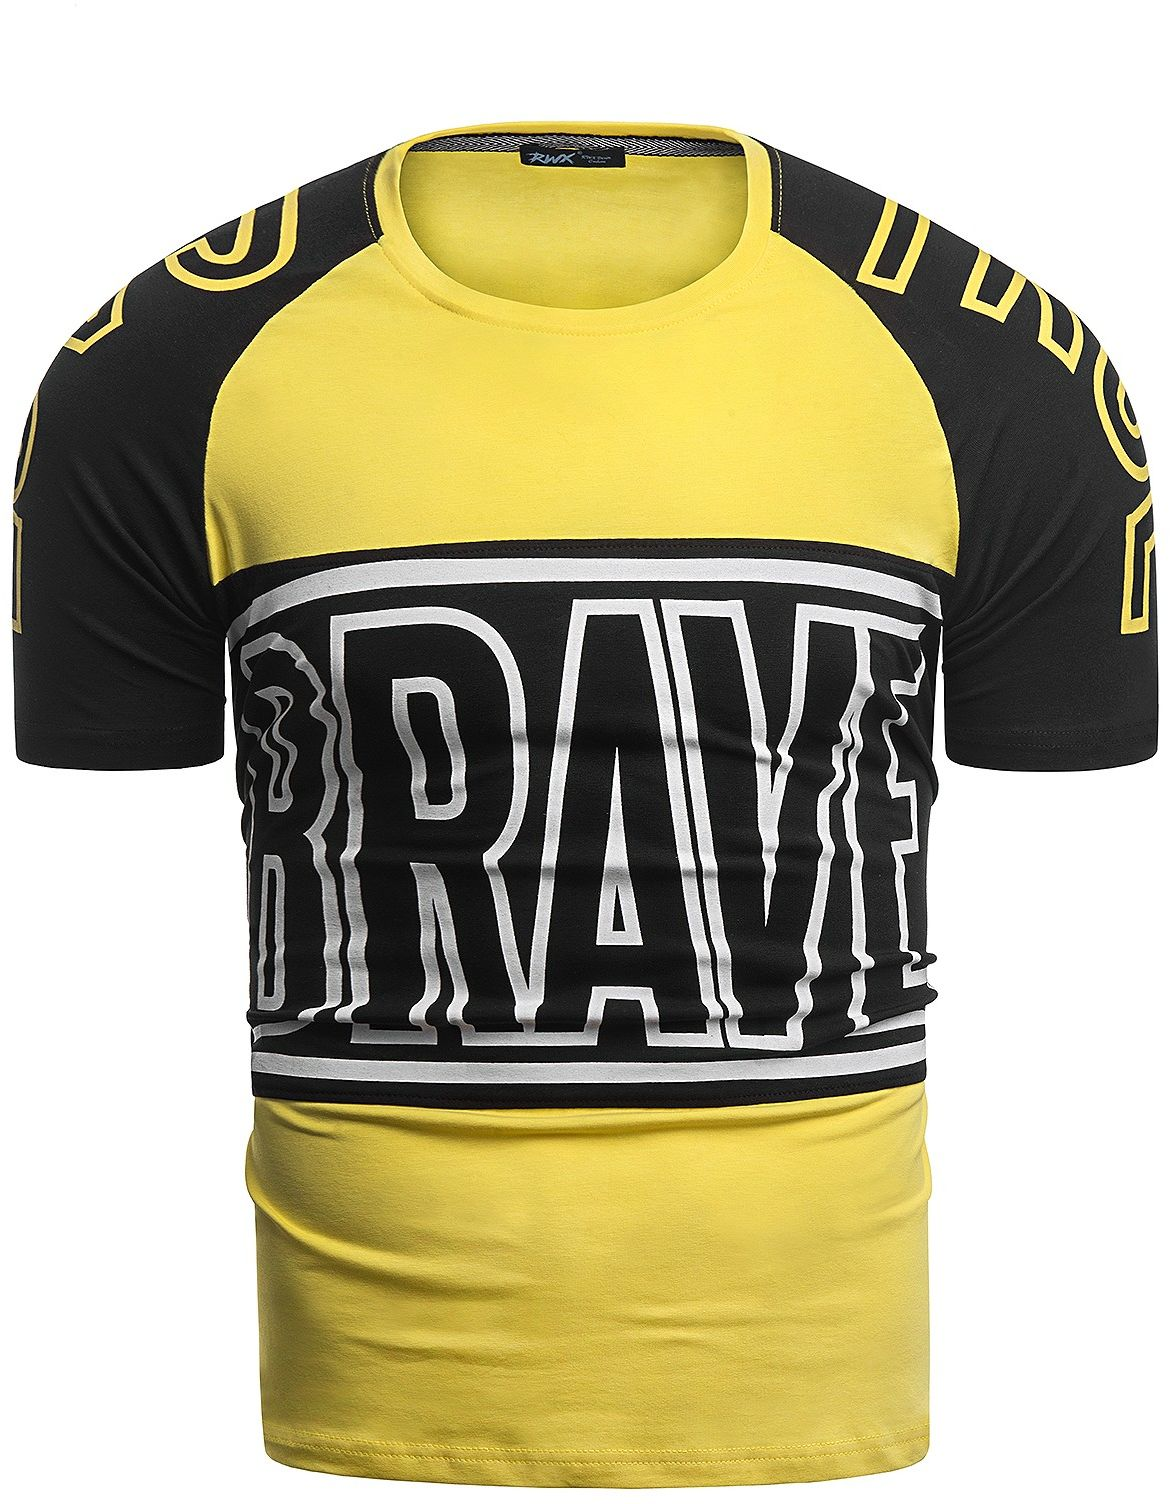 Męska koszulka t-shirt 2070 - żółta